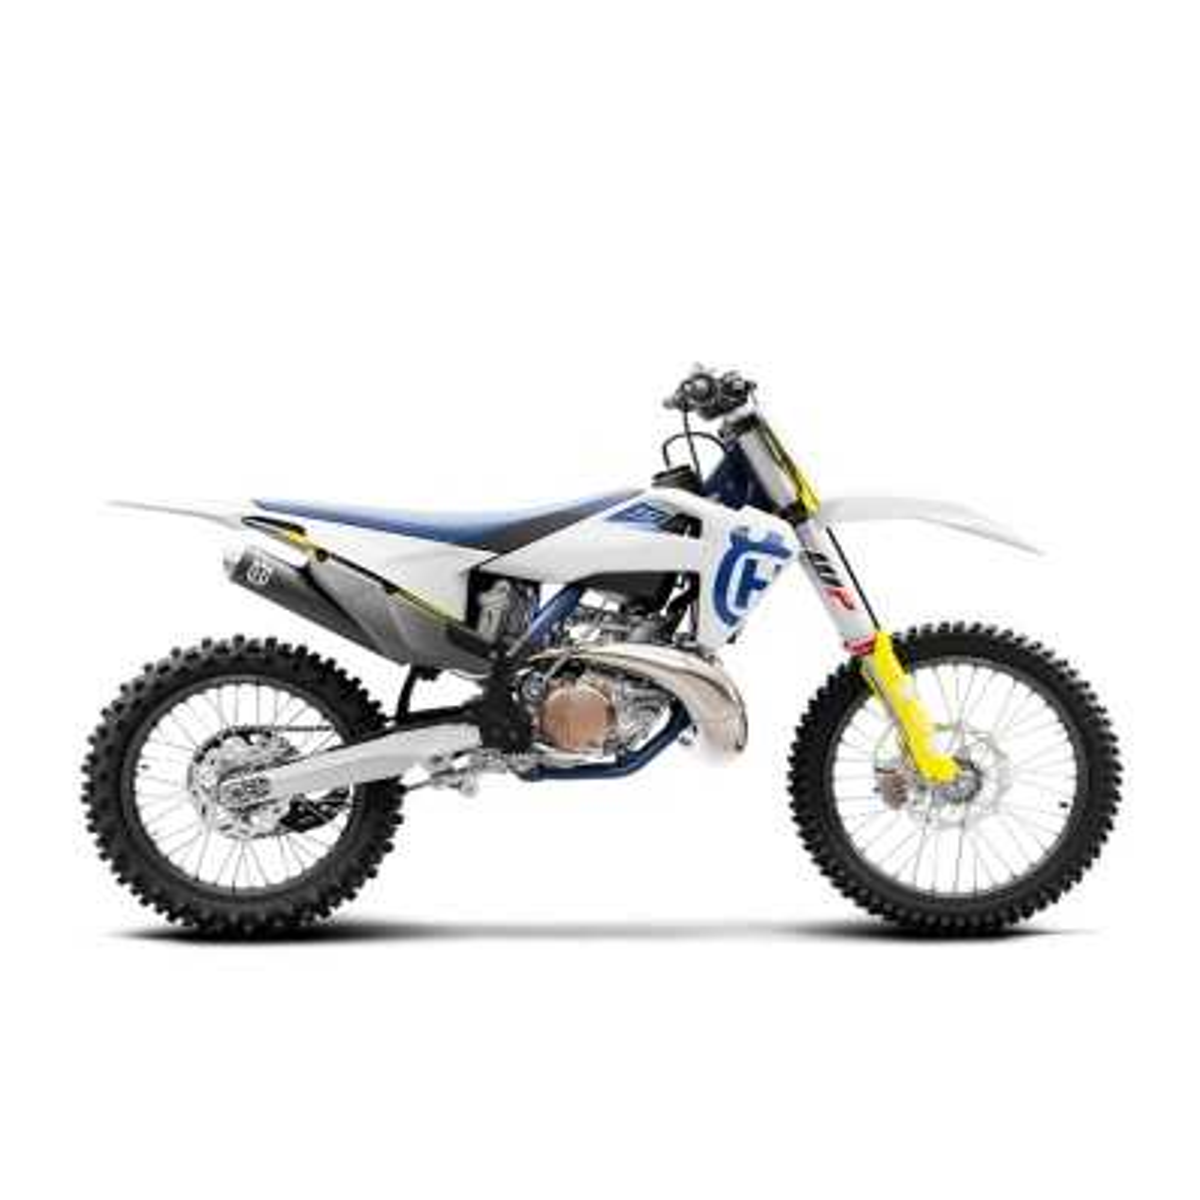 hsqv014 - Husqvarna Tc 250 2020